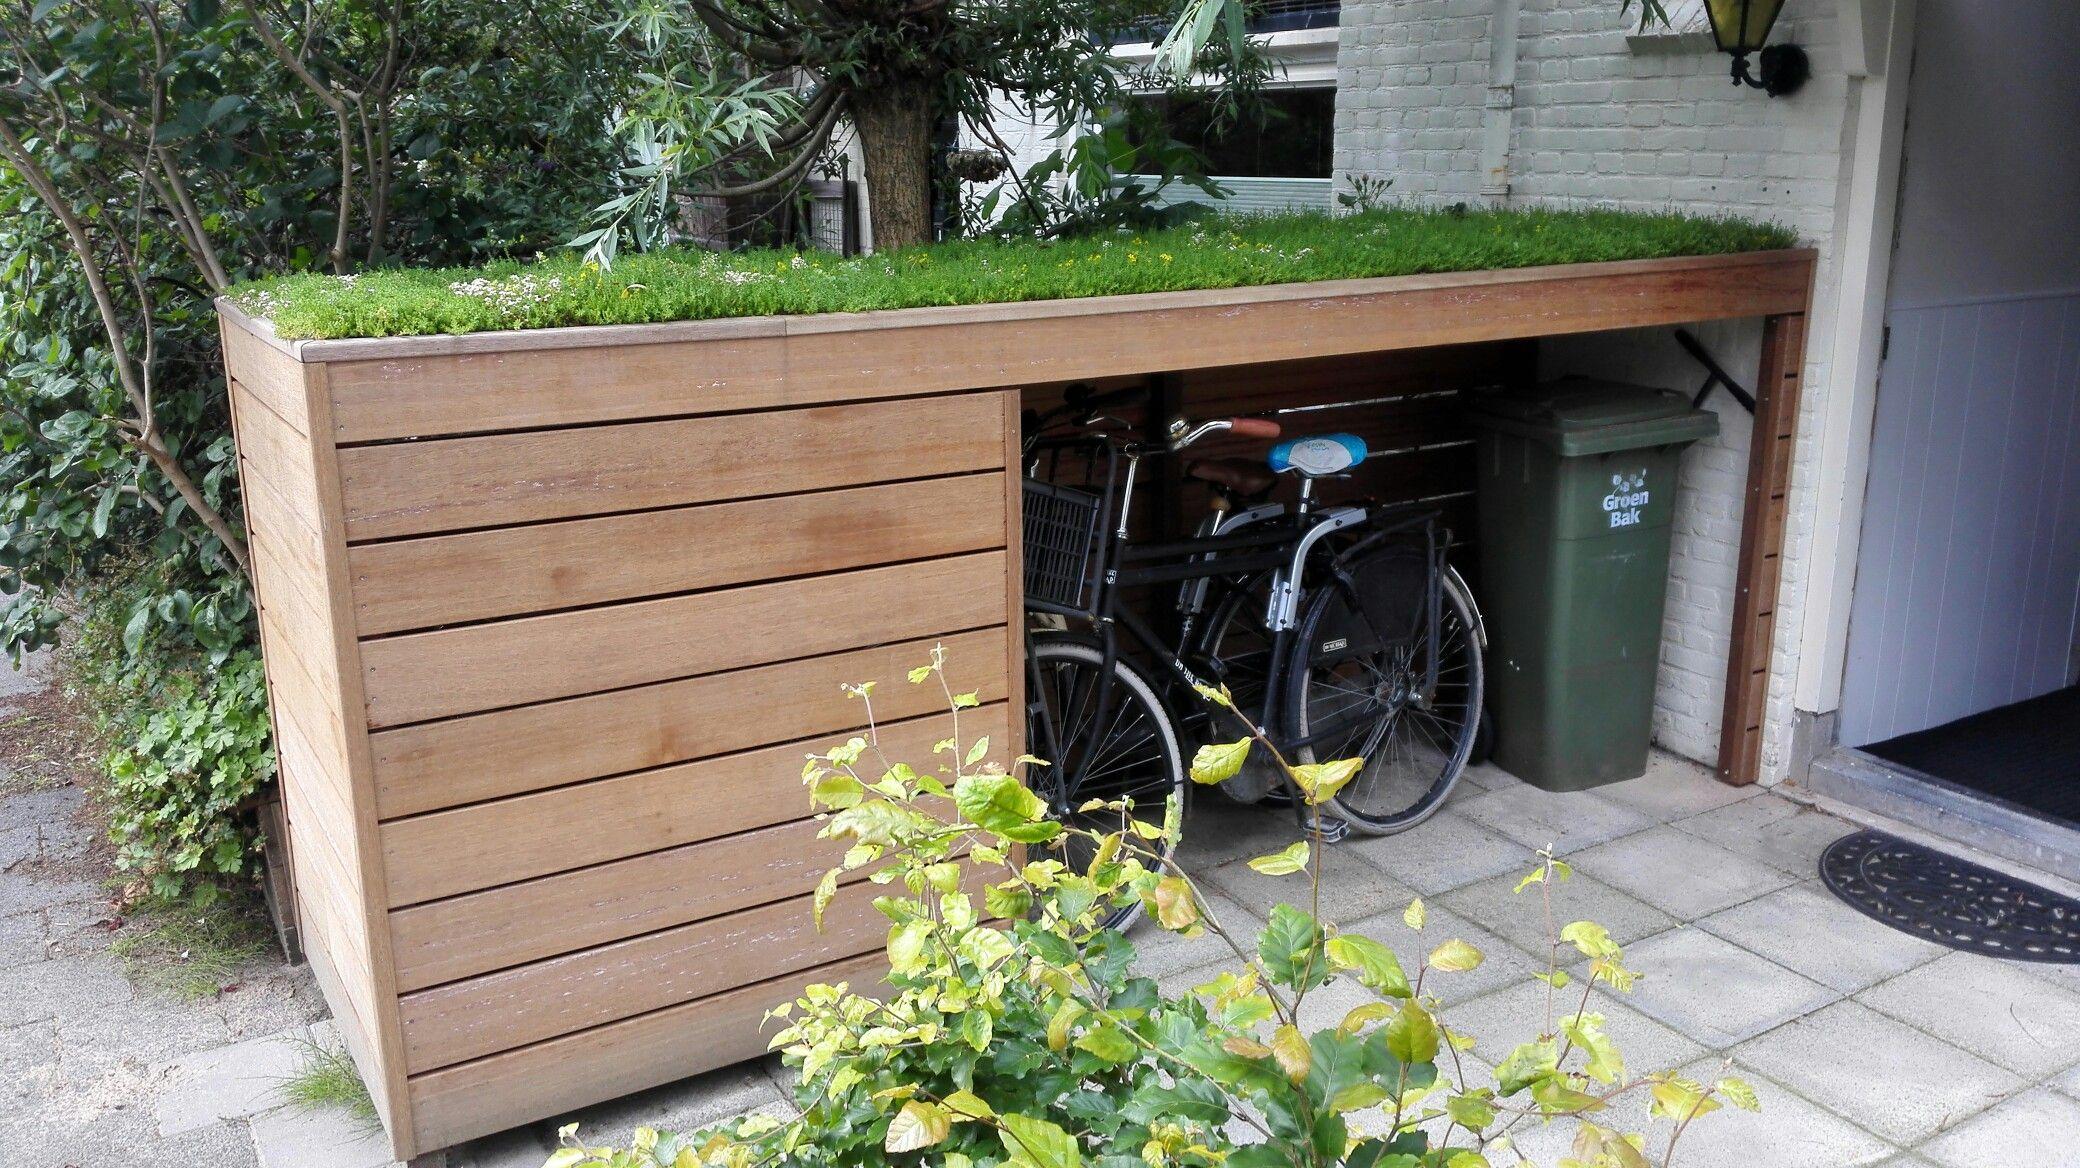 fietsenberging met groen dak garten pinterest g rten m lltonne und fahrradgarage. Black Bedroom Furniture Sets. Home Design Ideas